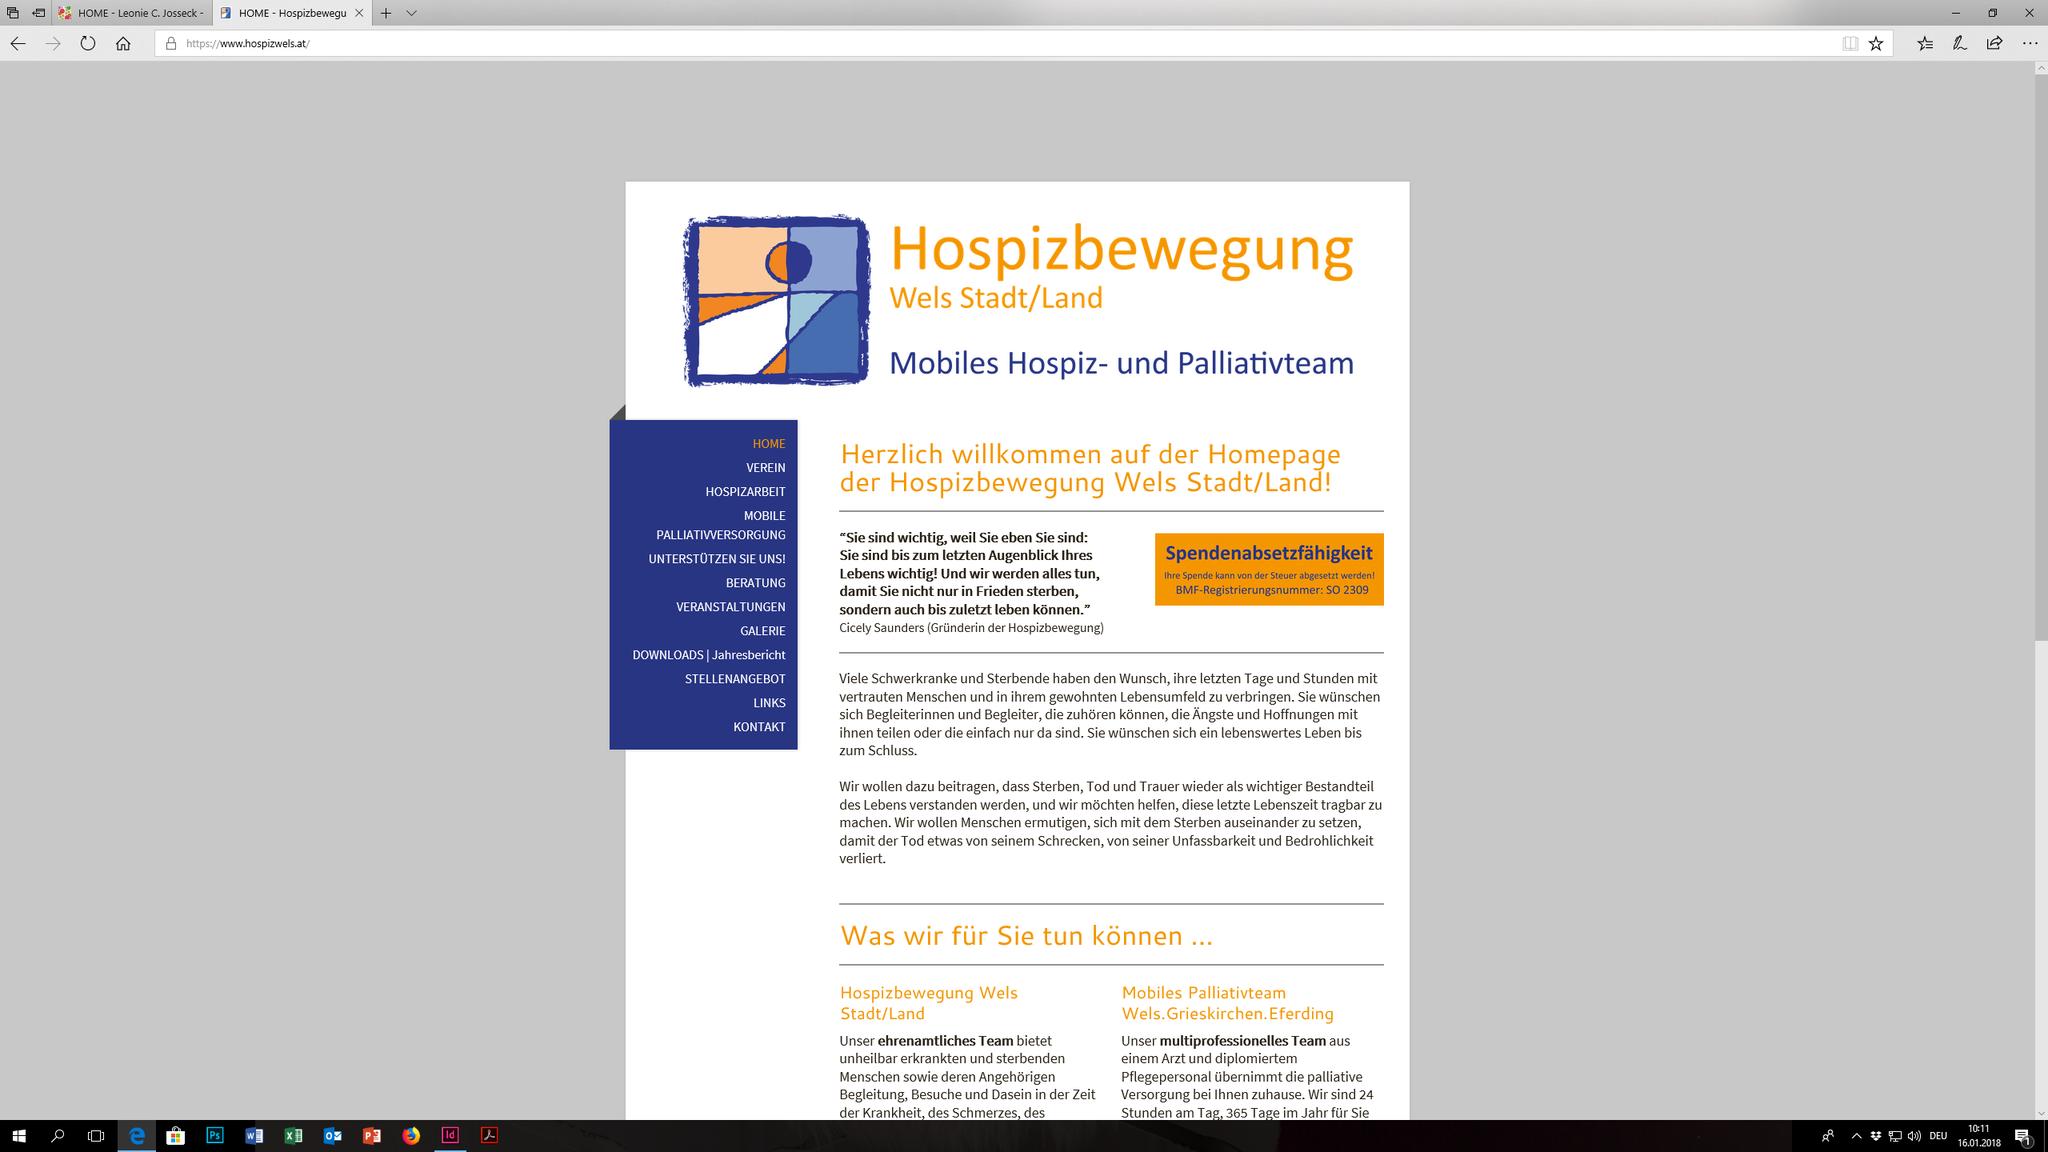 Hospizbewegung Wels Stadt/Land: Web-Design